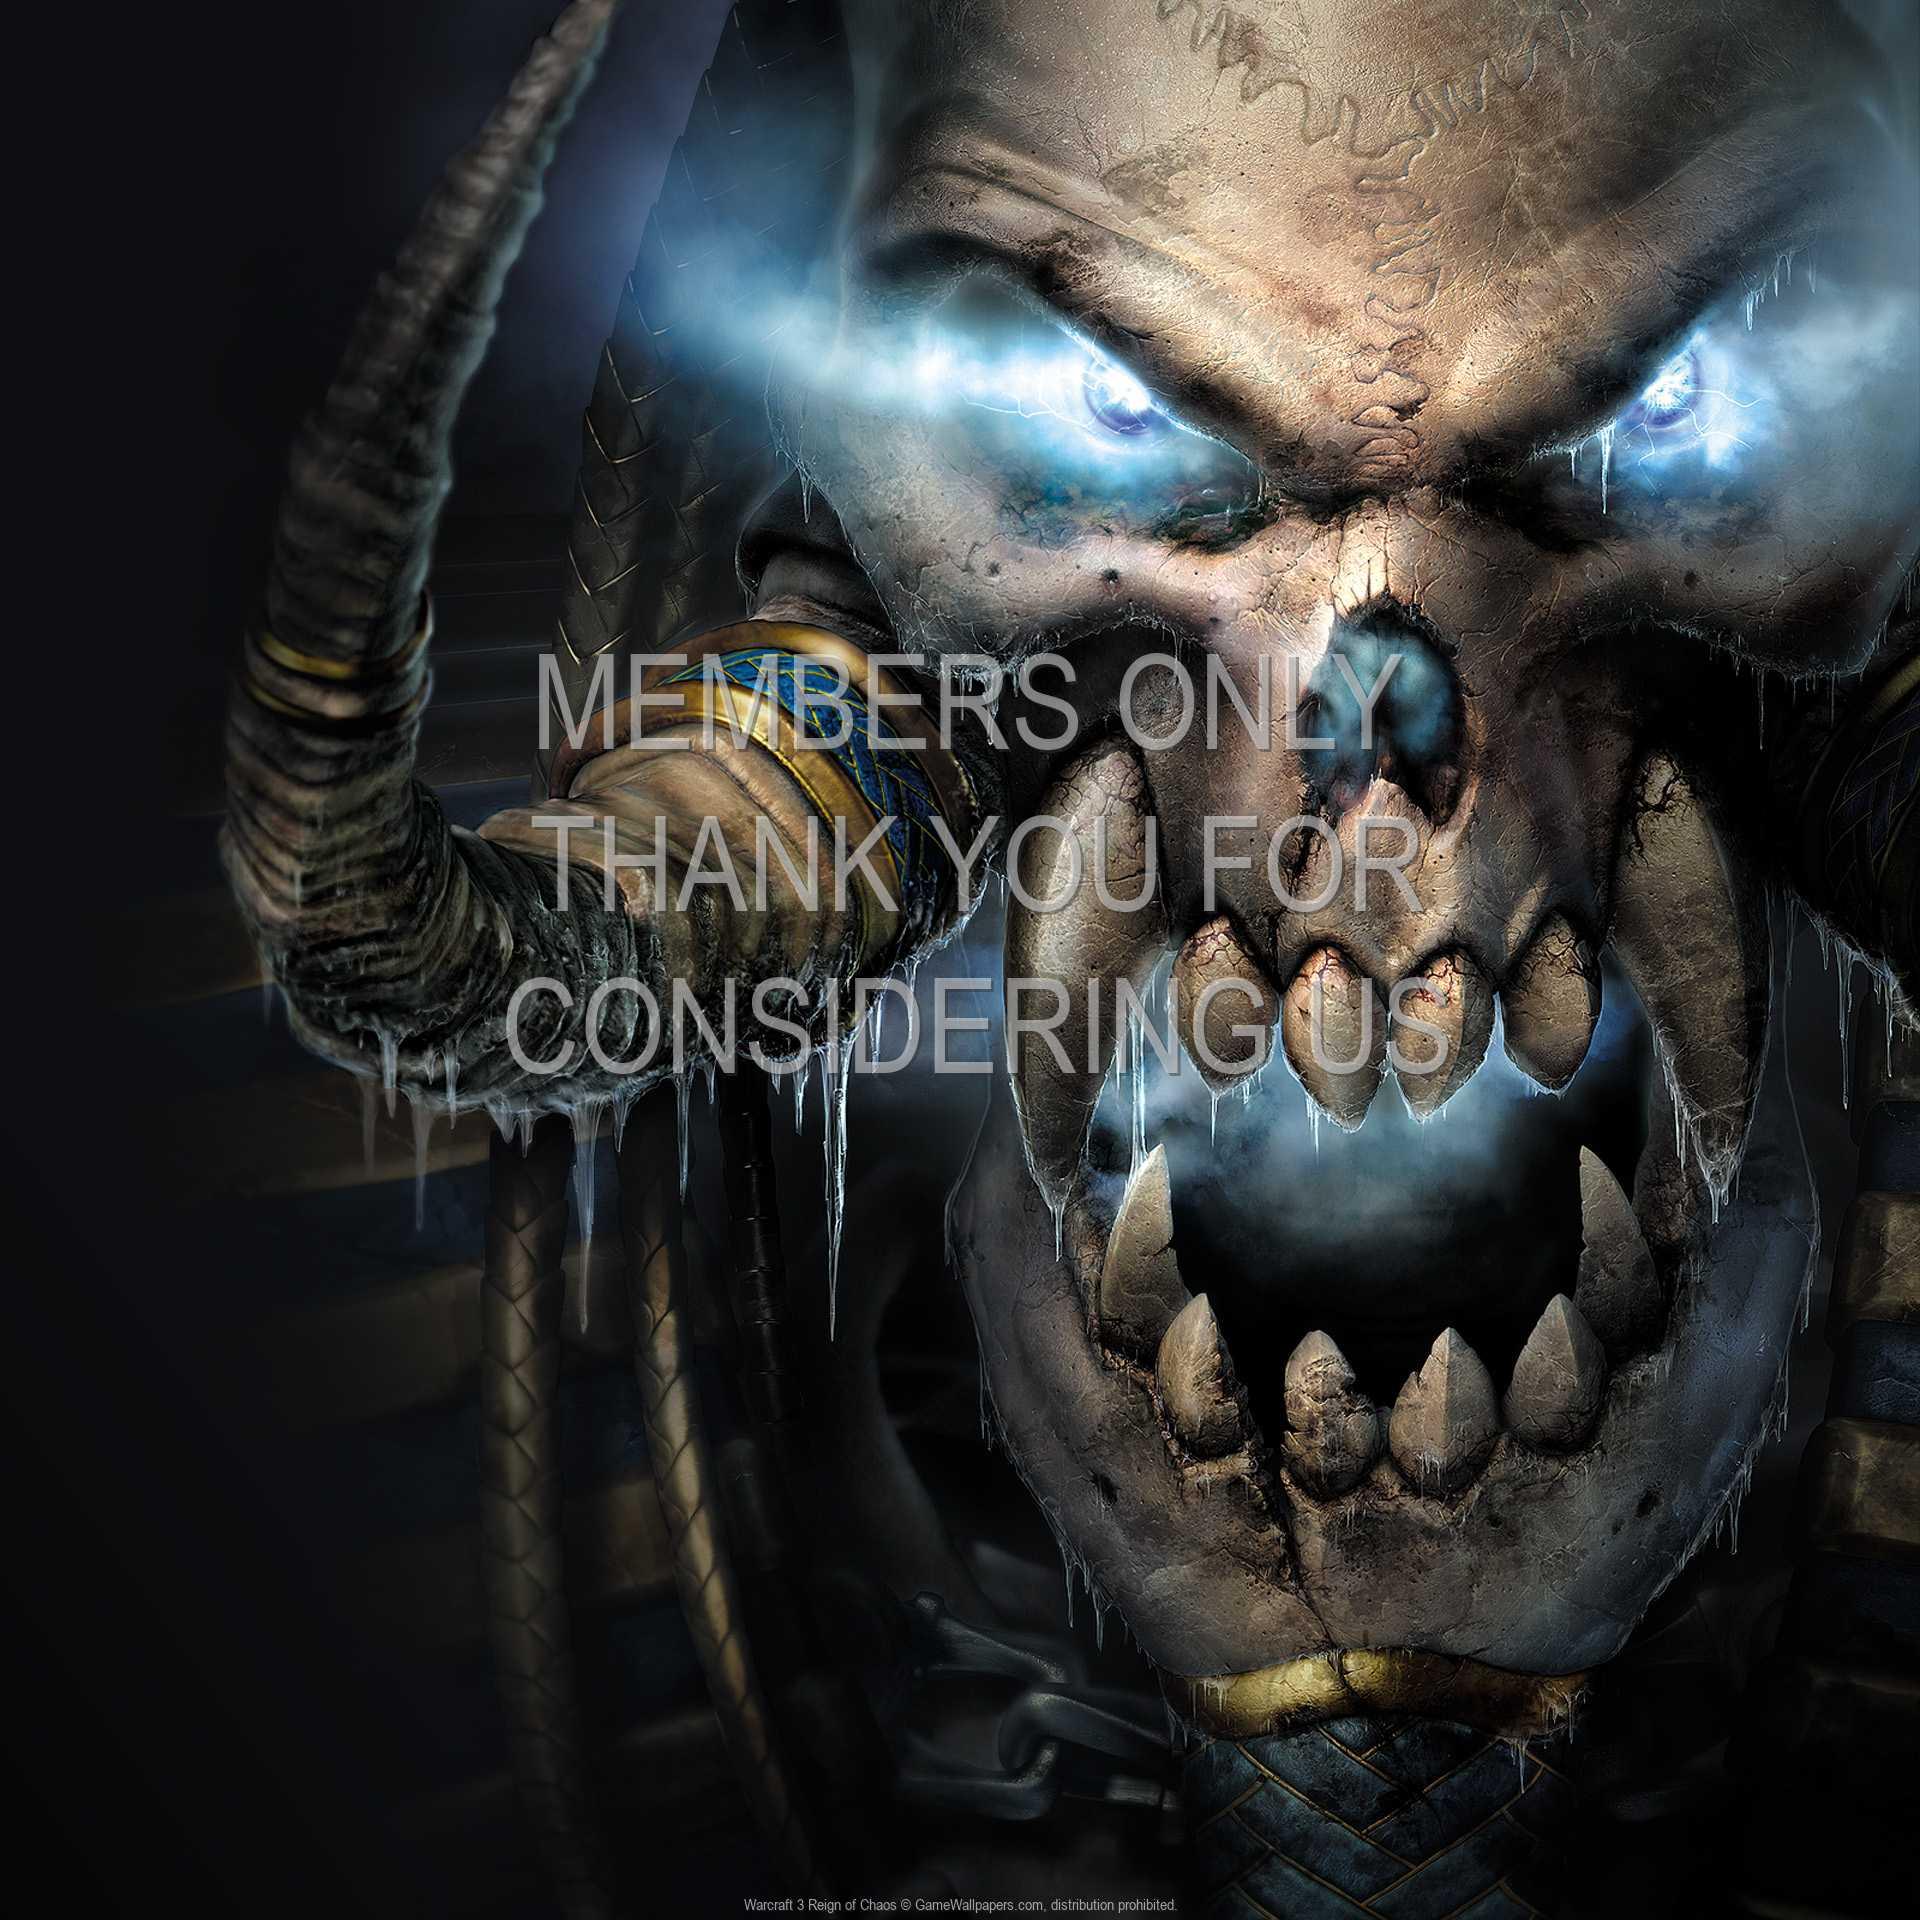 Warcraft 3: Reign of Chaos 1080p Horizontal Handy Hintergrundbild 20